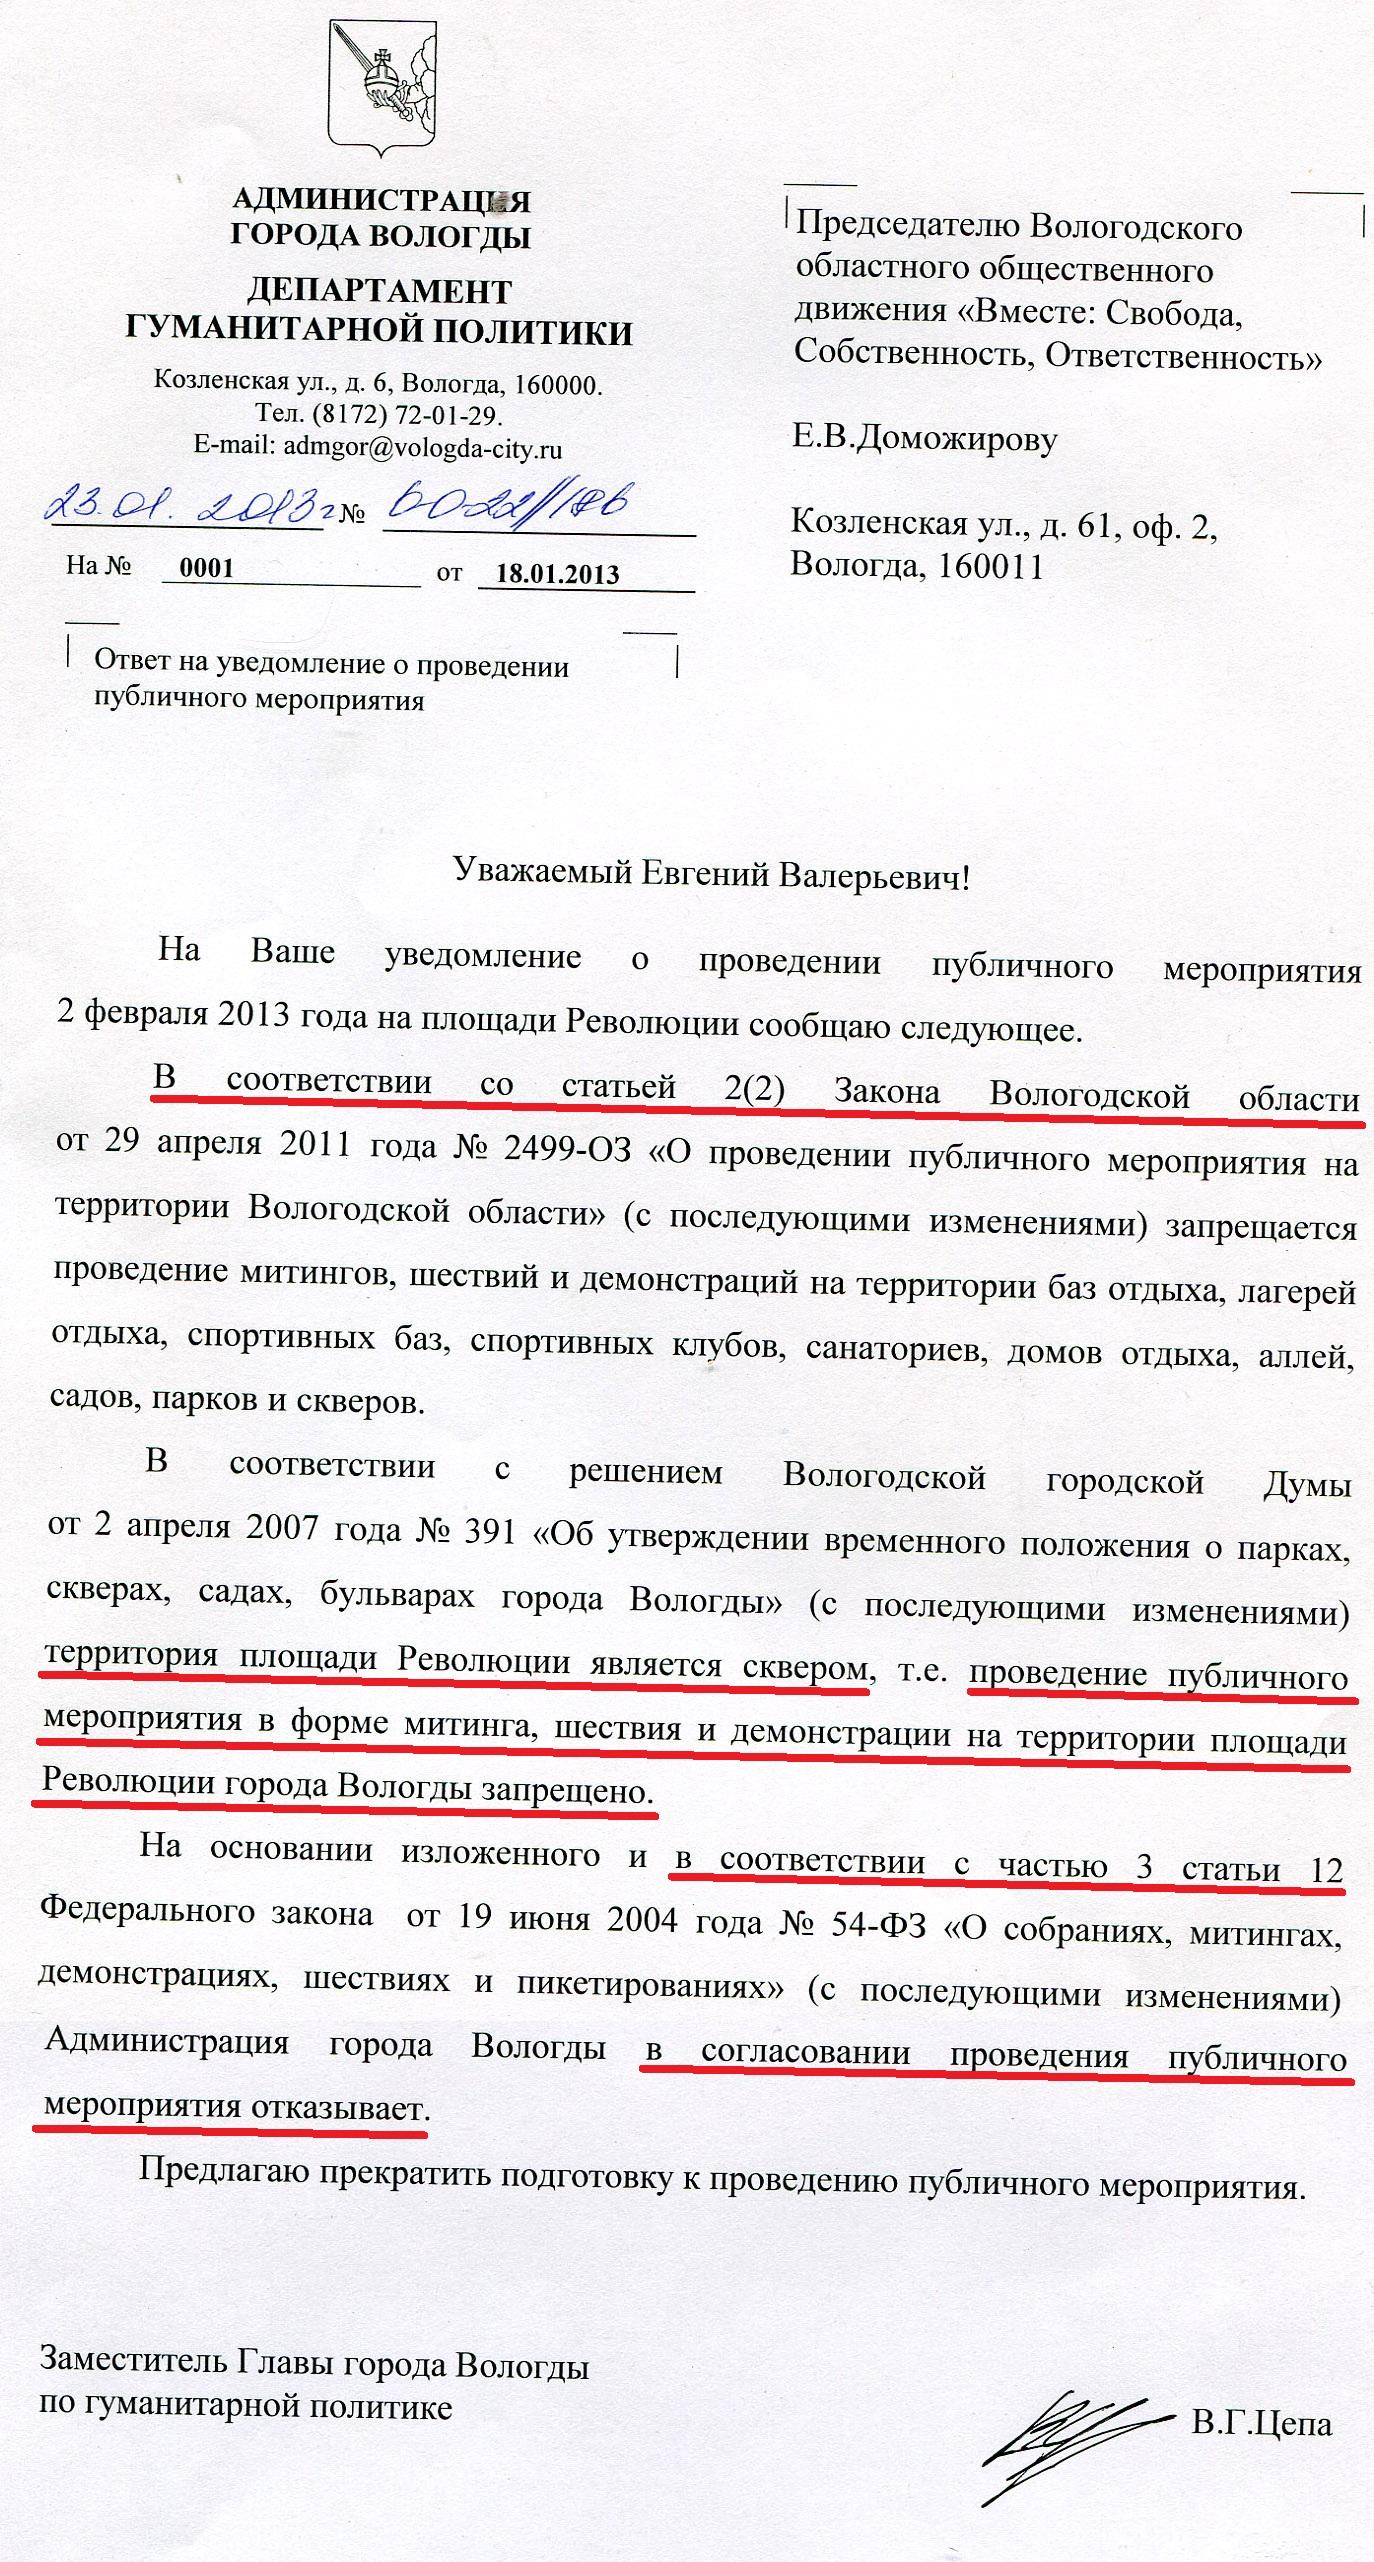 Ответ администрации по митингу на 02.02.13